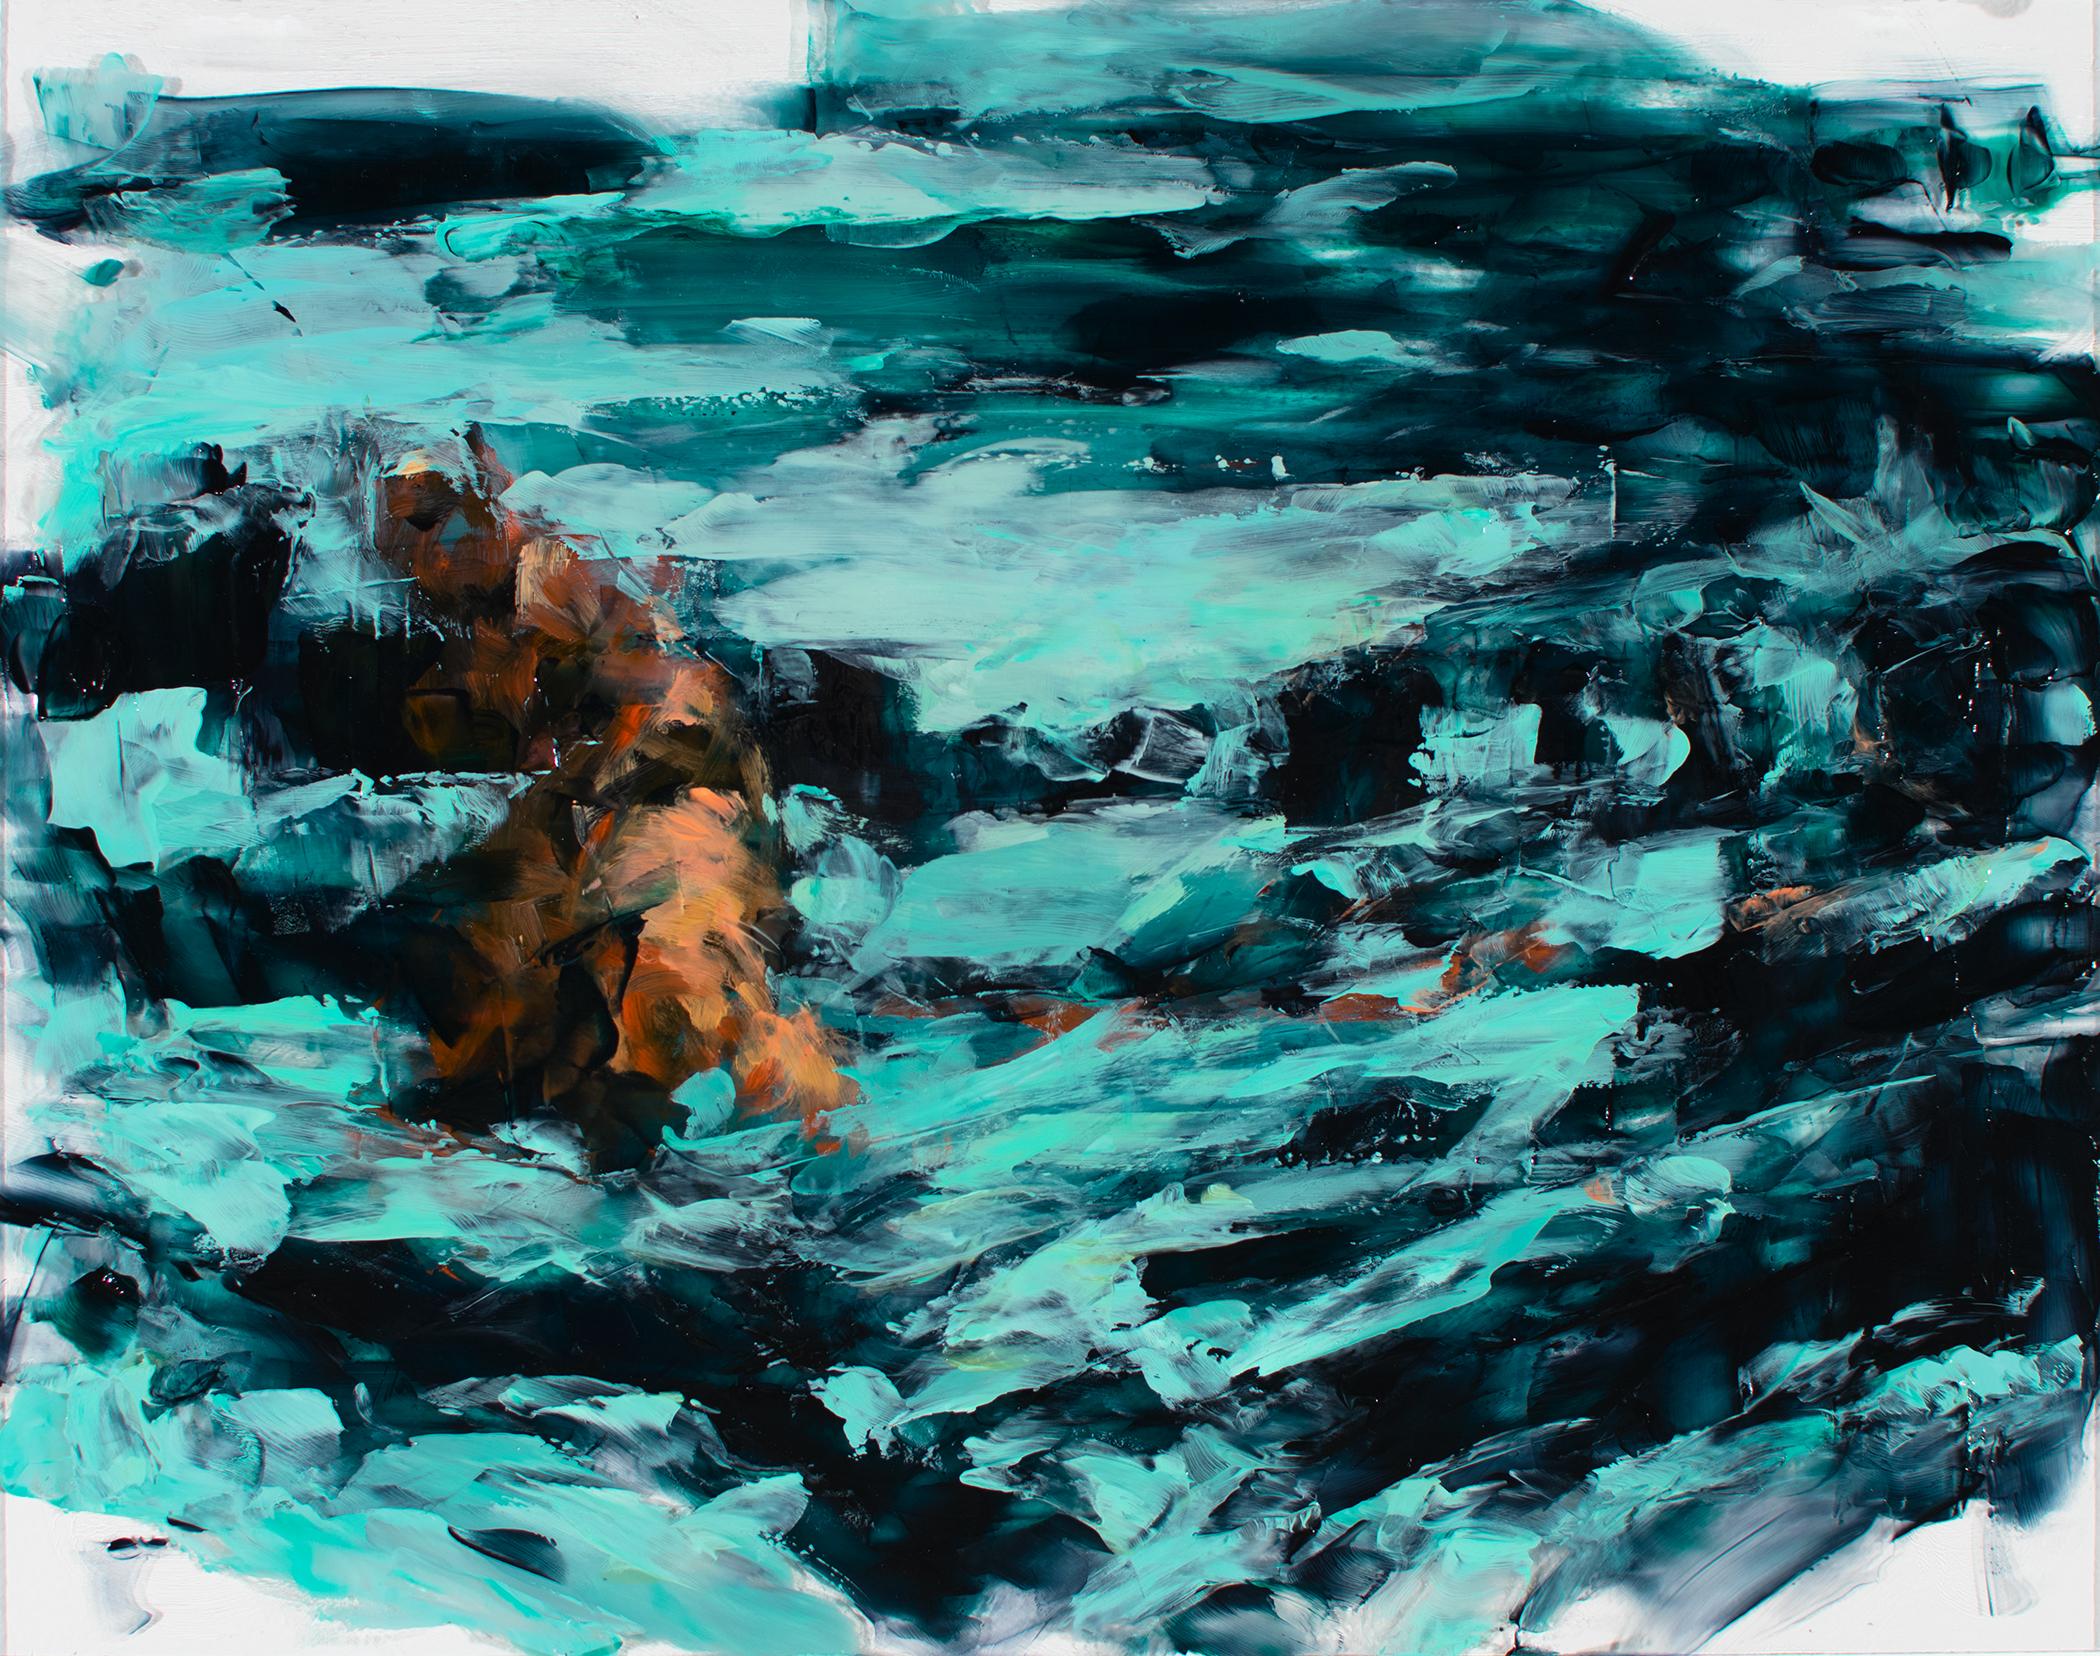 "'Lost', oil and acrylic on plexiglass, 11"" x 14"", 2017"